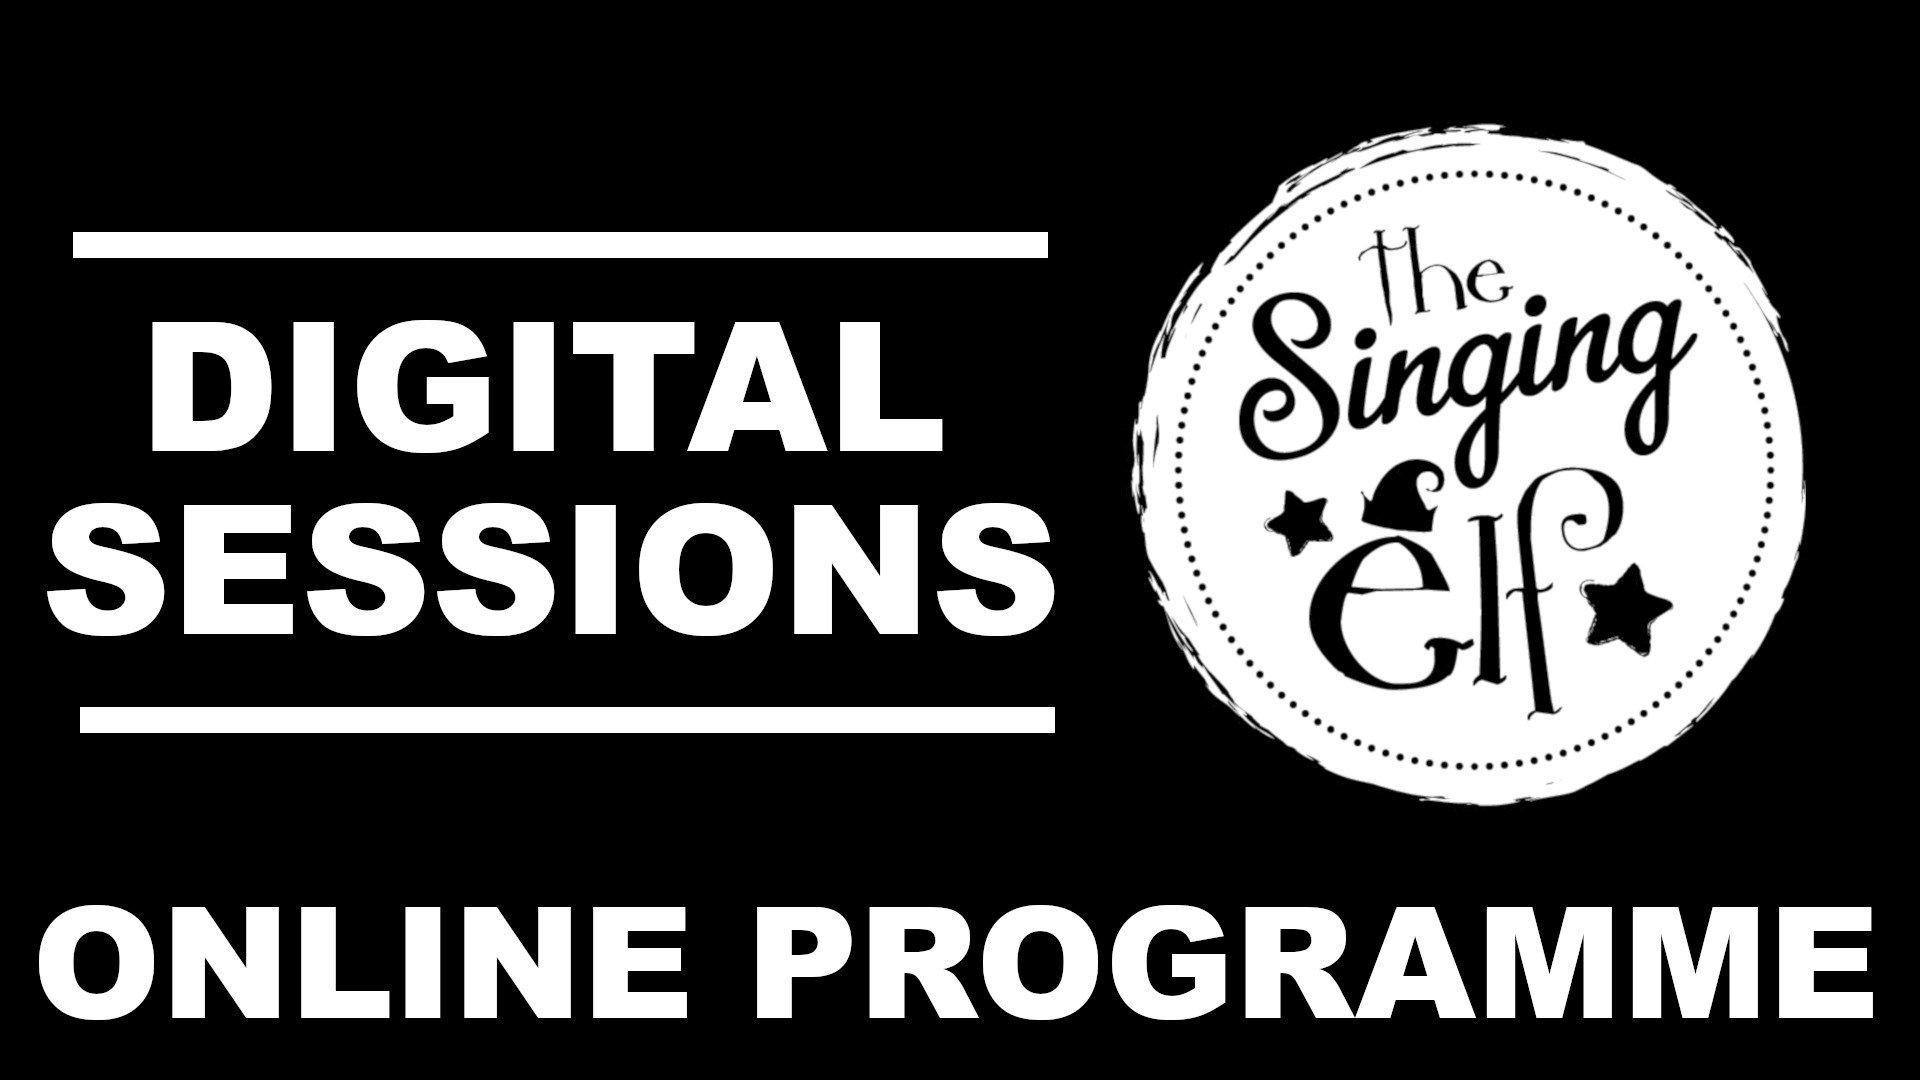 The Singing Elf Online Programme